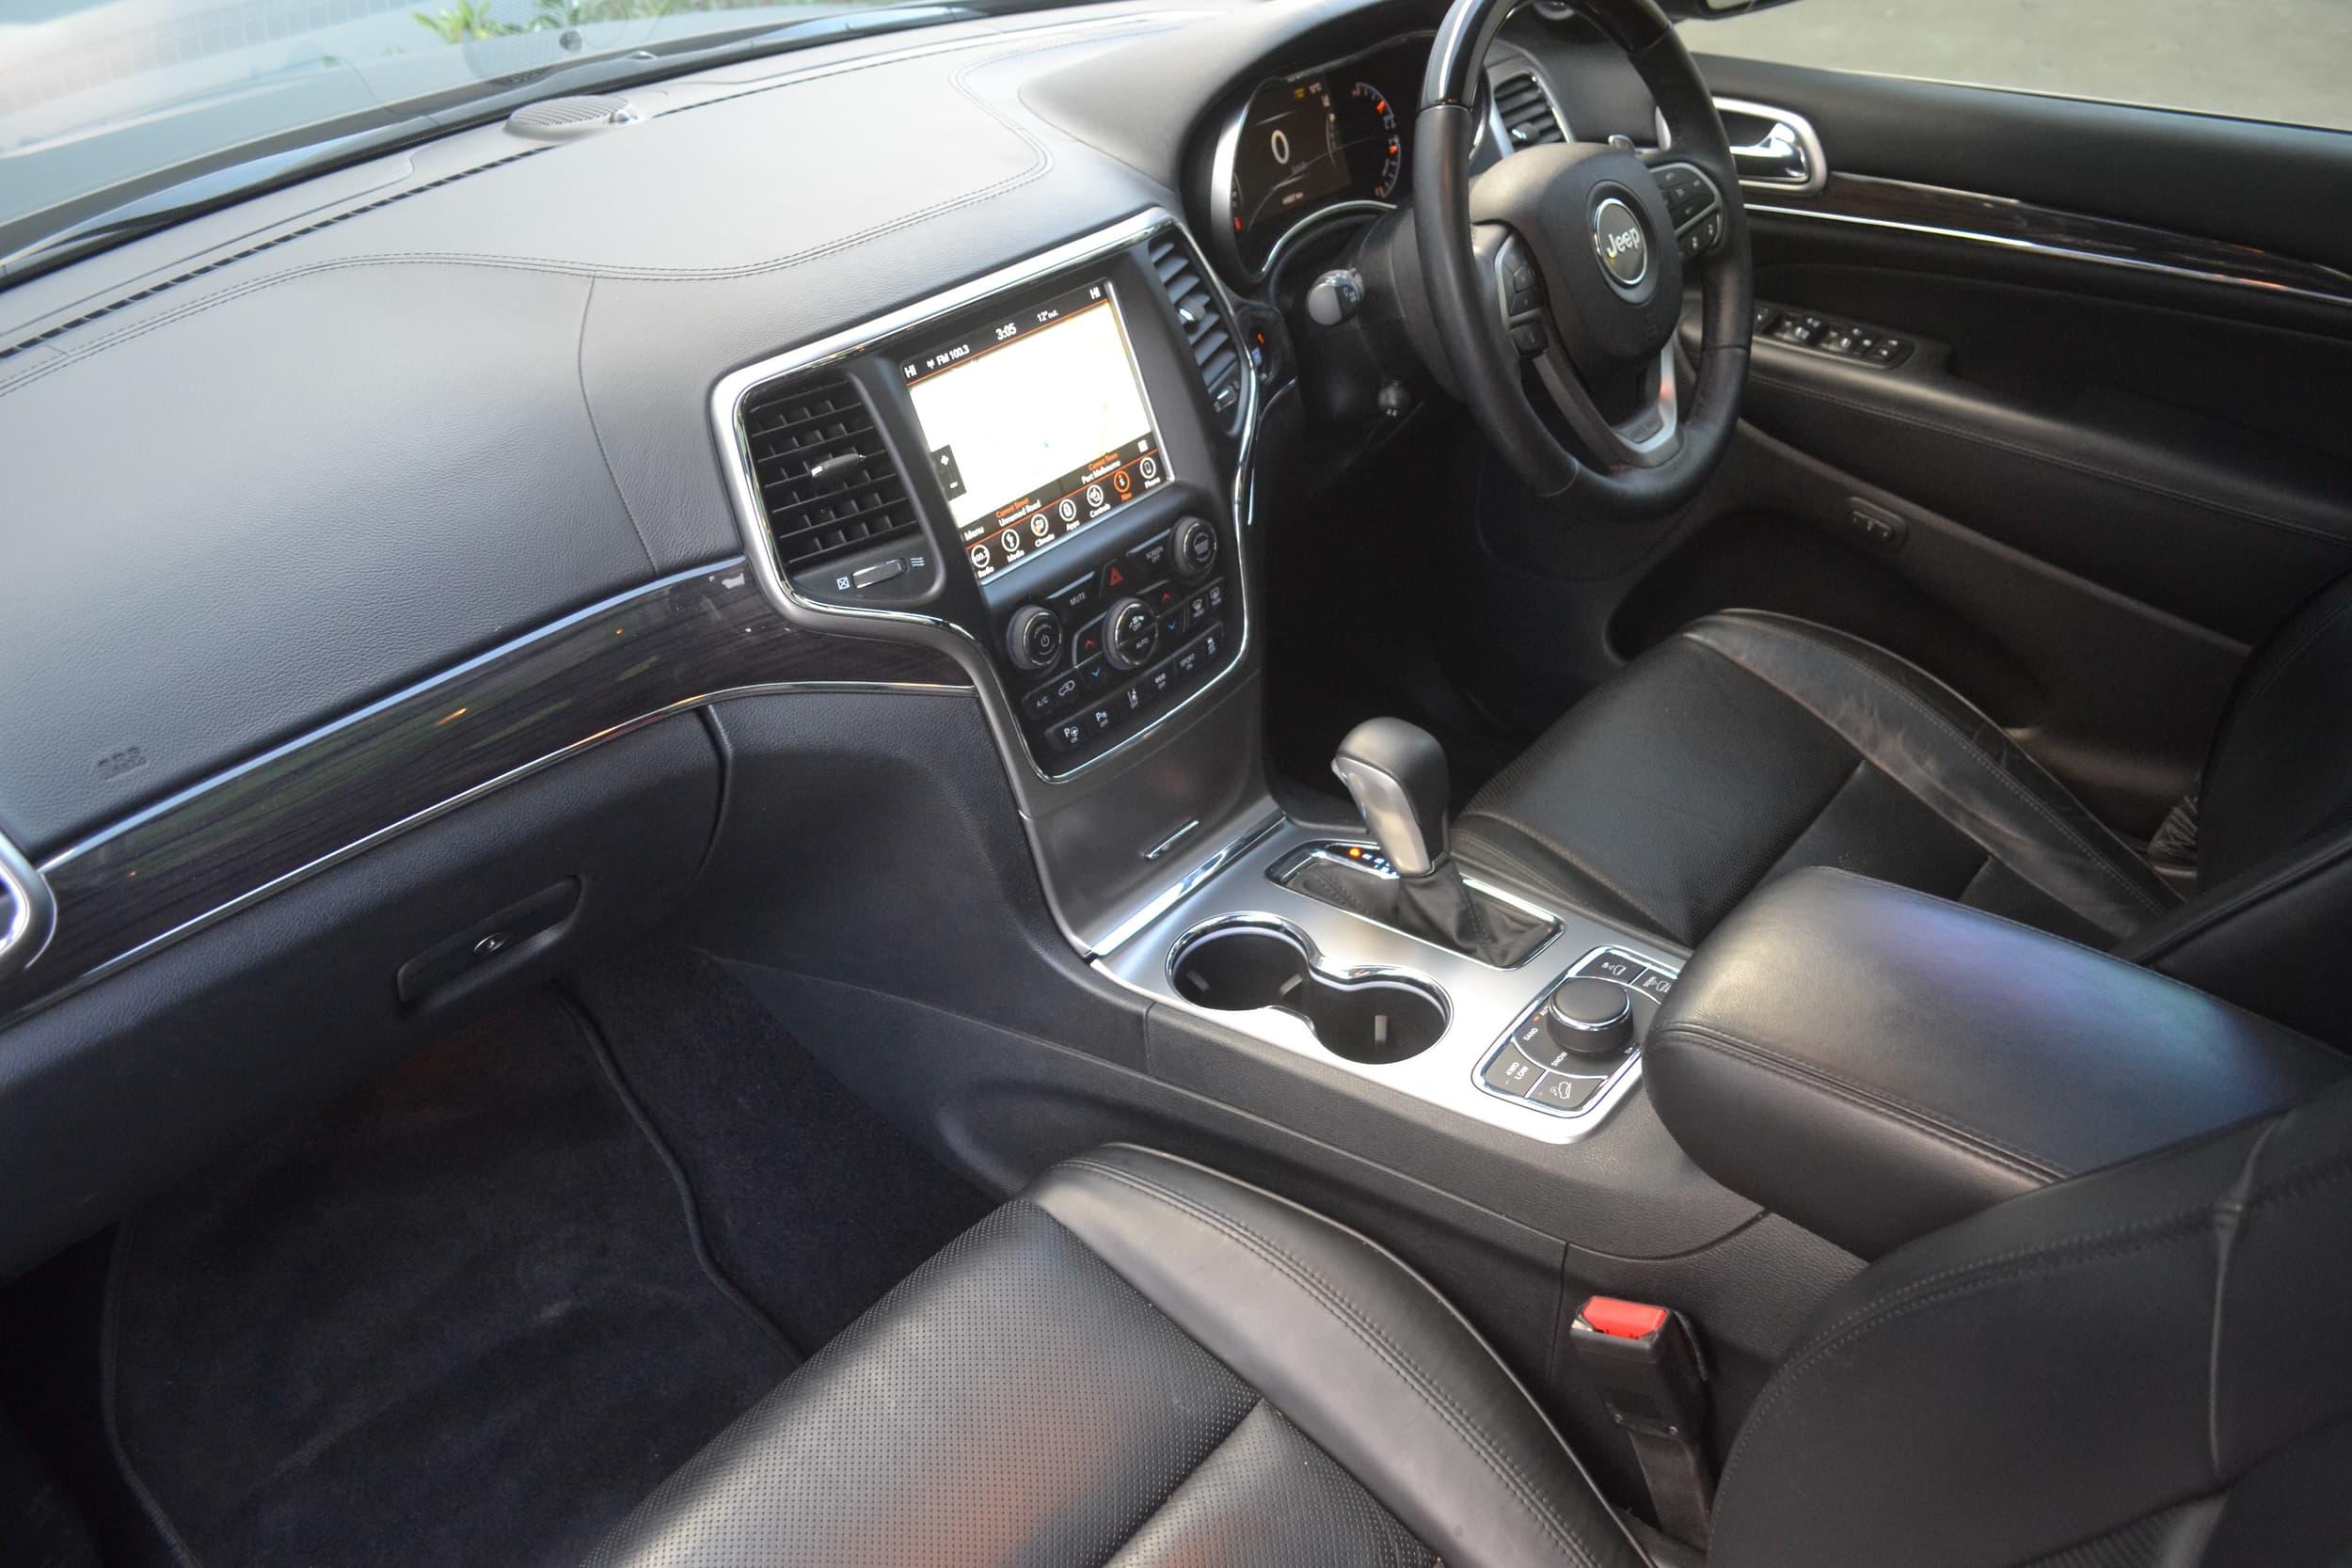 2018 Jeep Grand Cherokee Overland Auto 4x4 MY18 - image 11